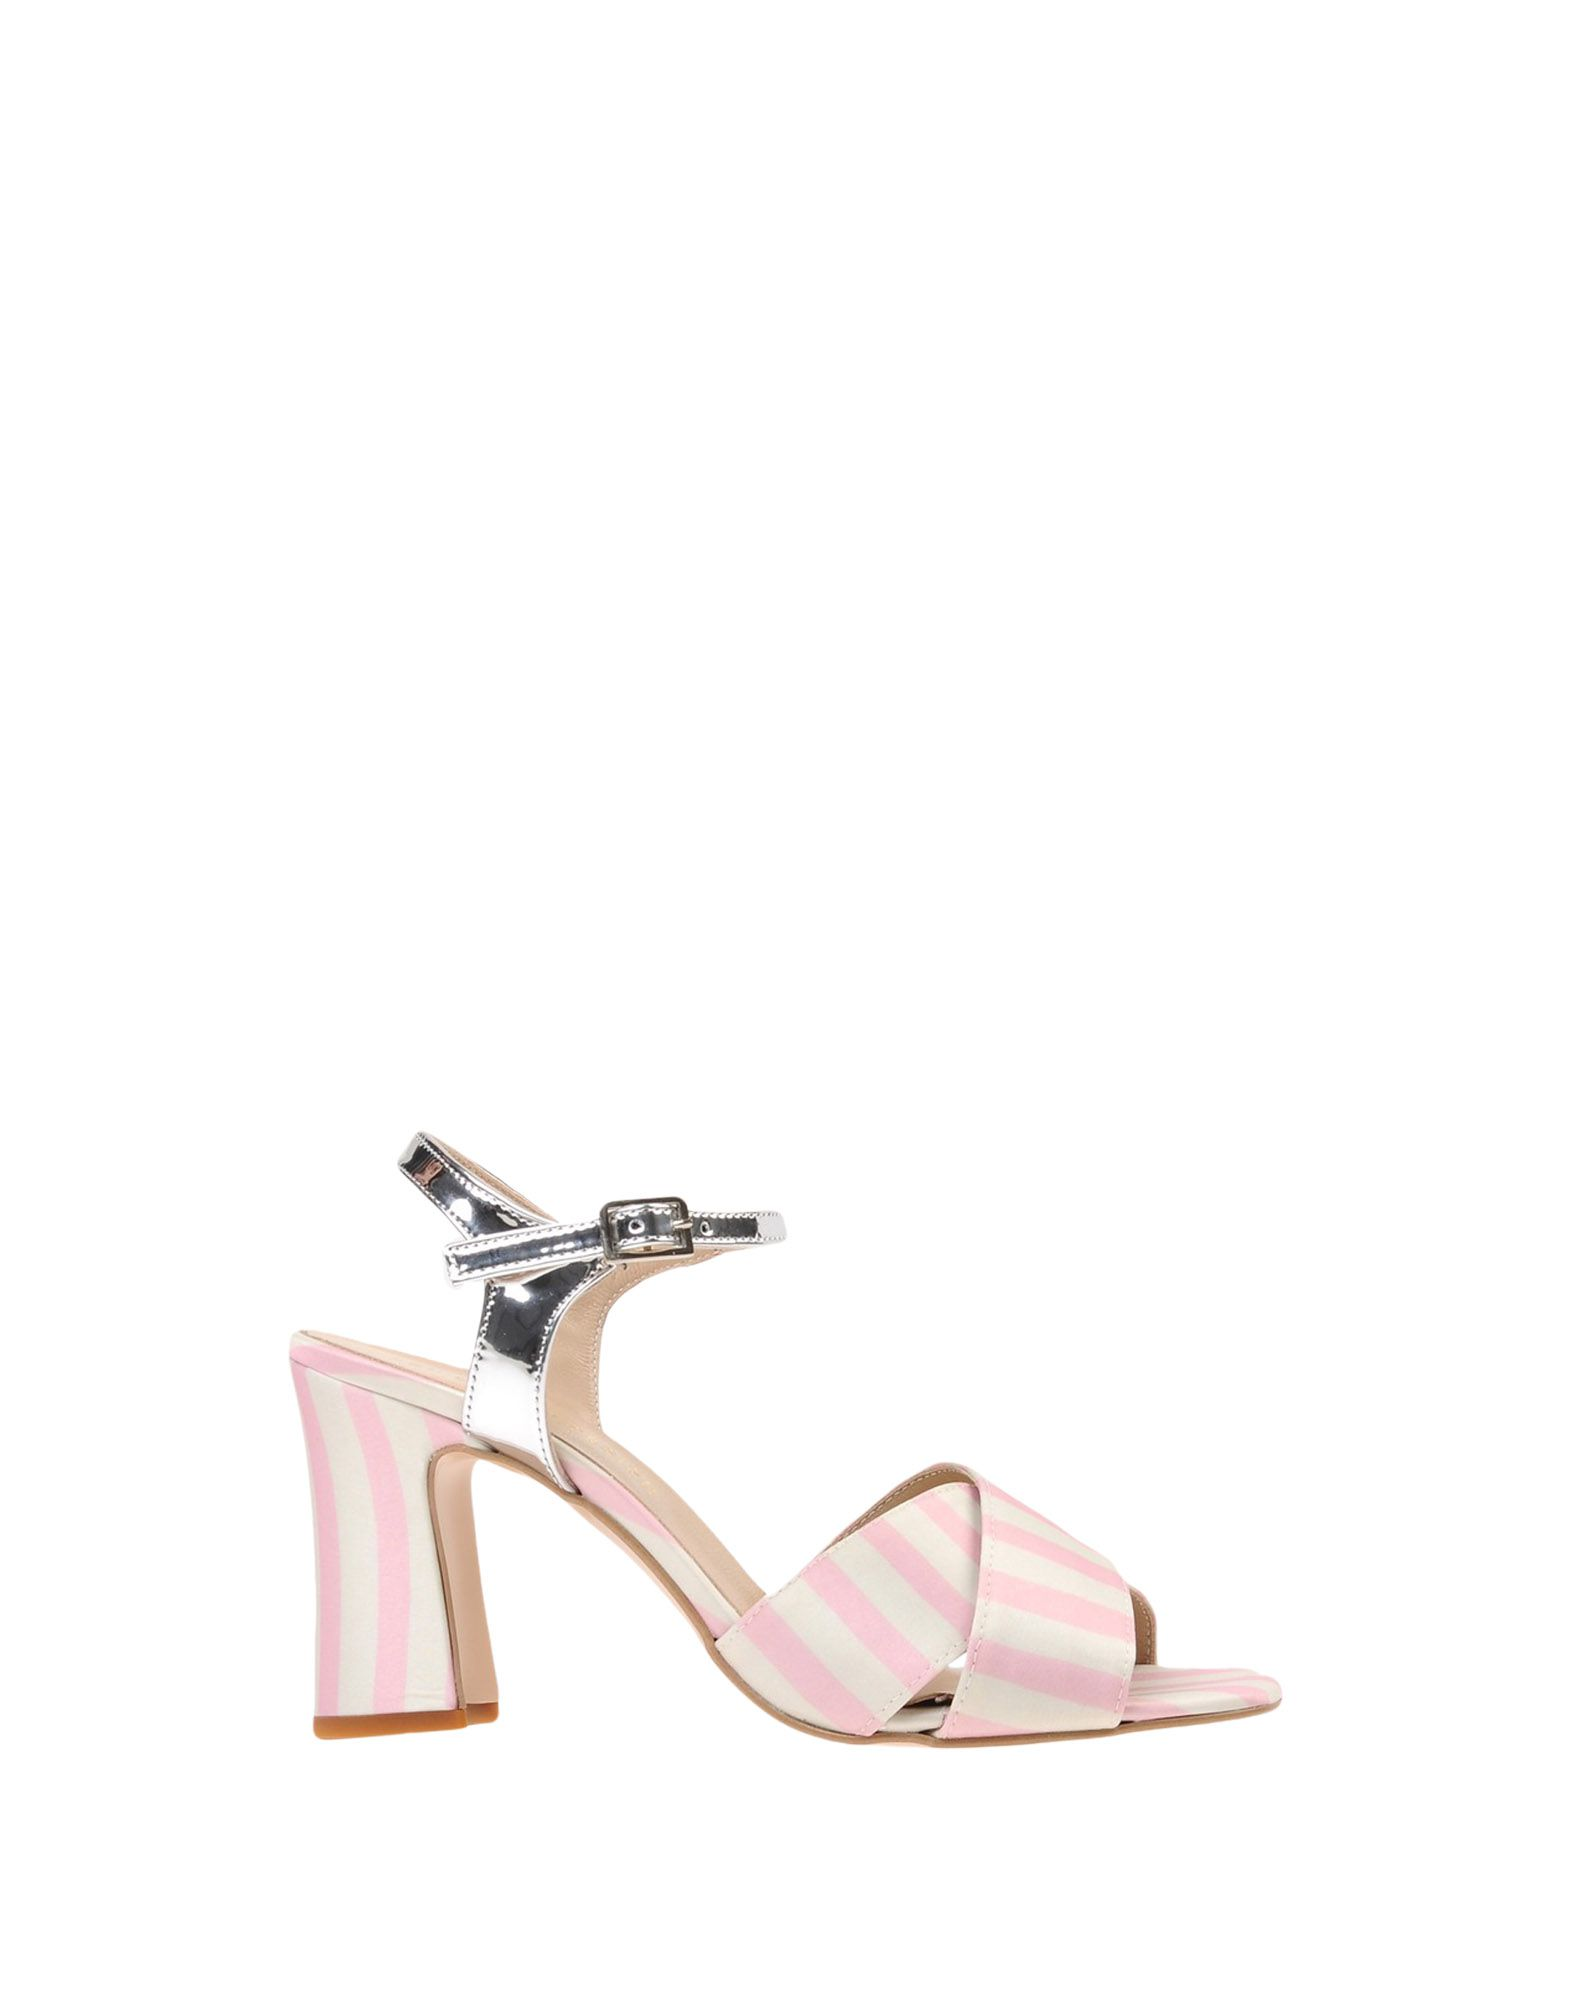 Sandales Leo Studio Design New Heel Sandal - Femme - Sandales Leo Studio Design sur